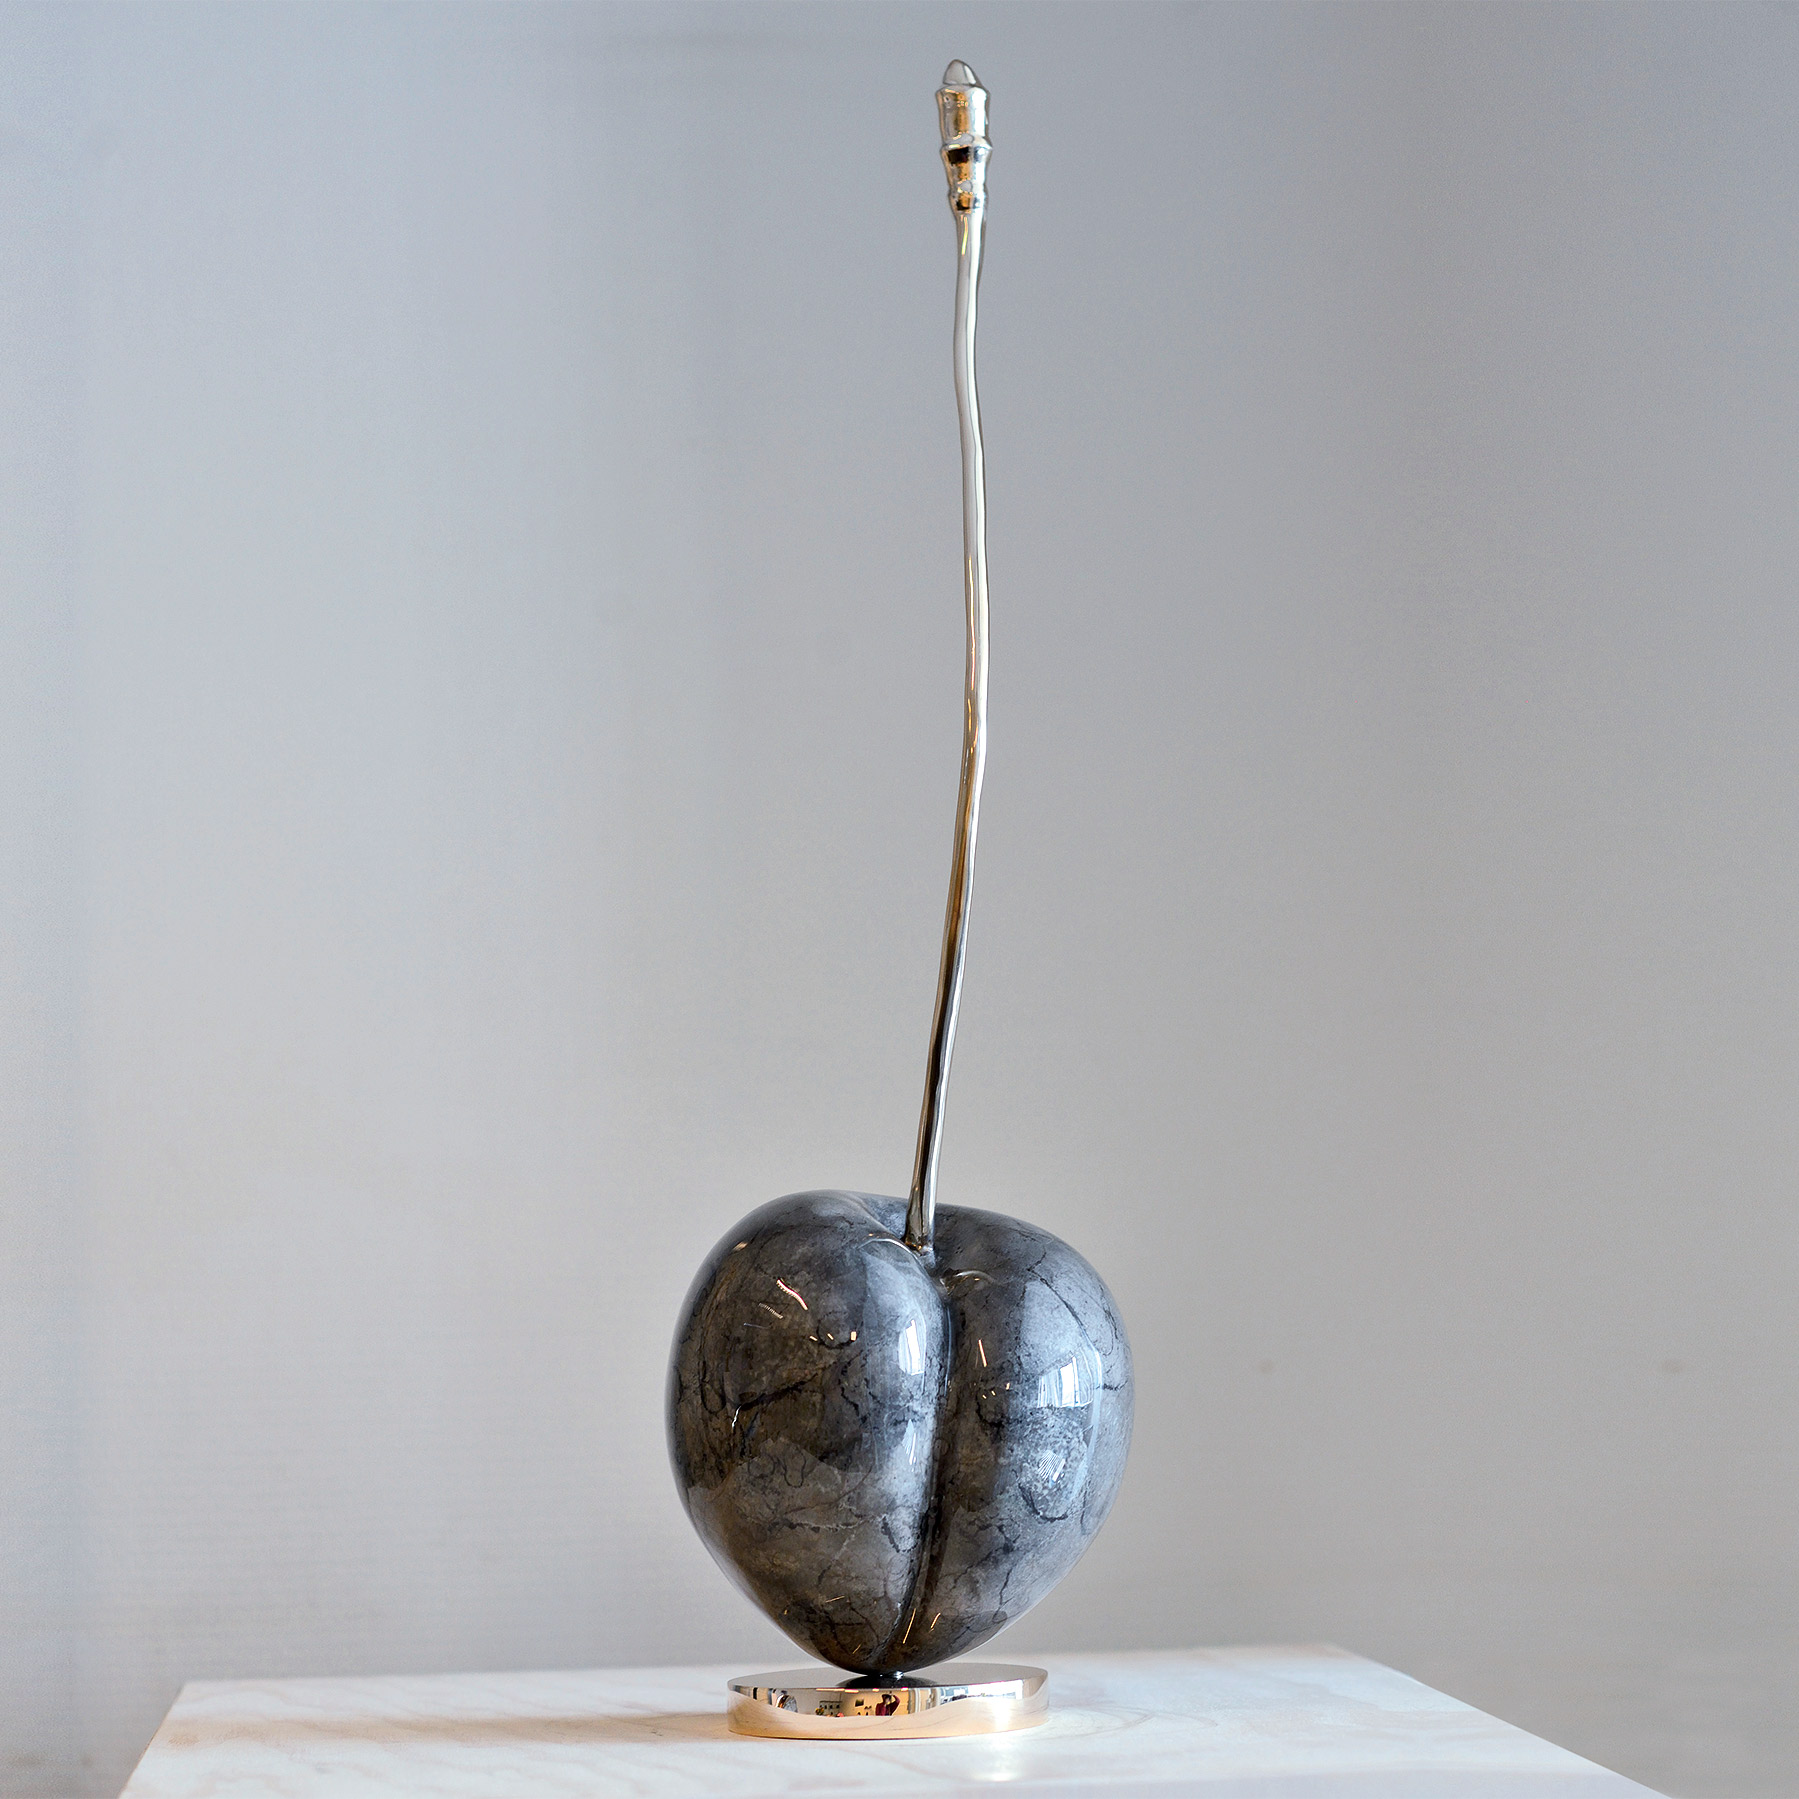 lothar-vierkant-portfolio-cherry-silver-marble-2